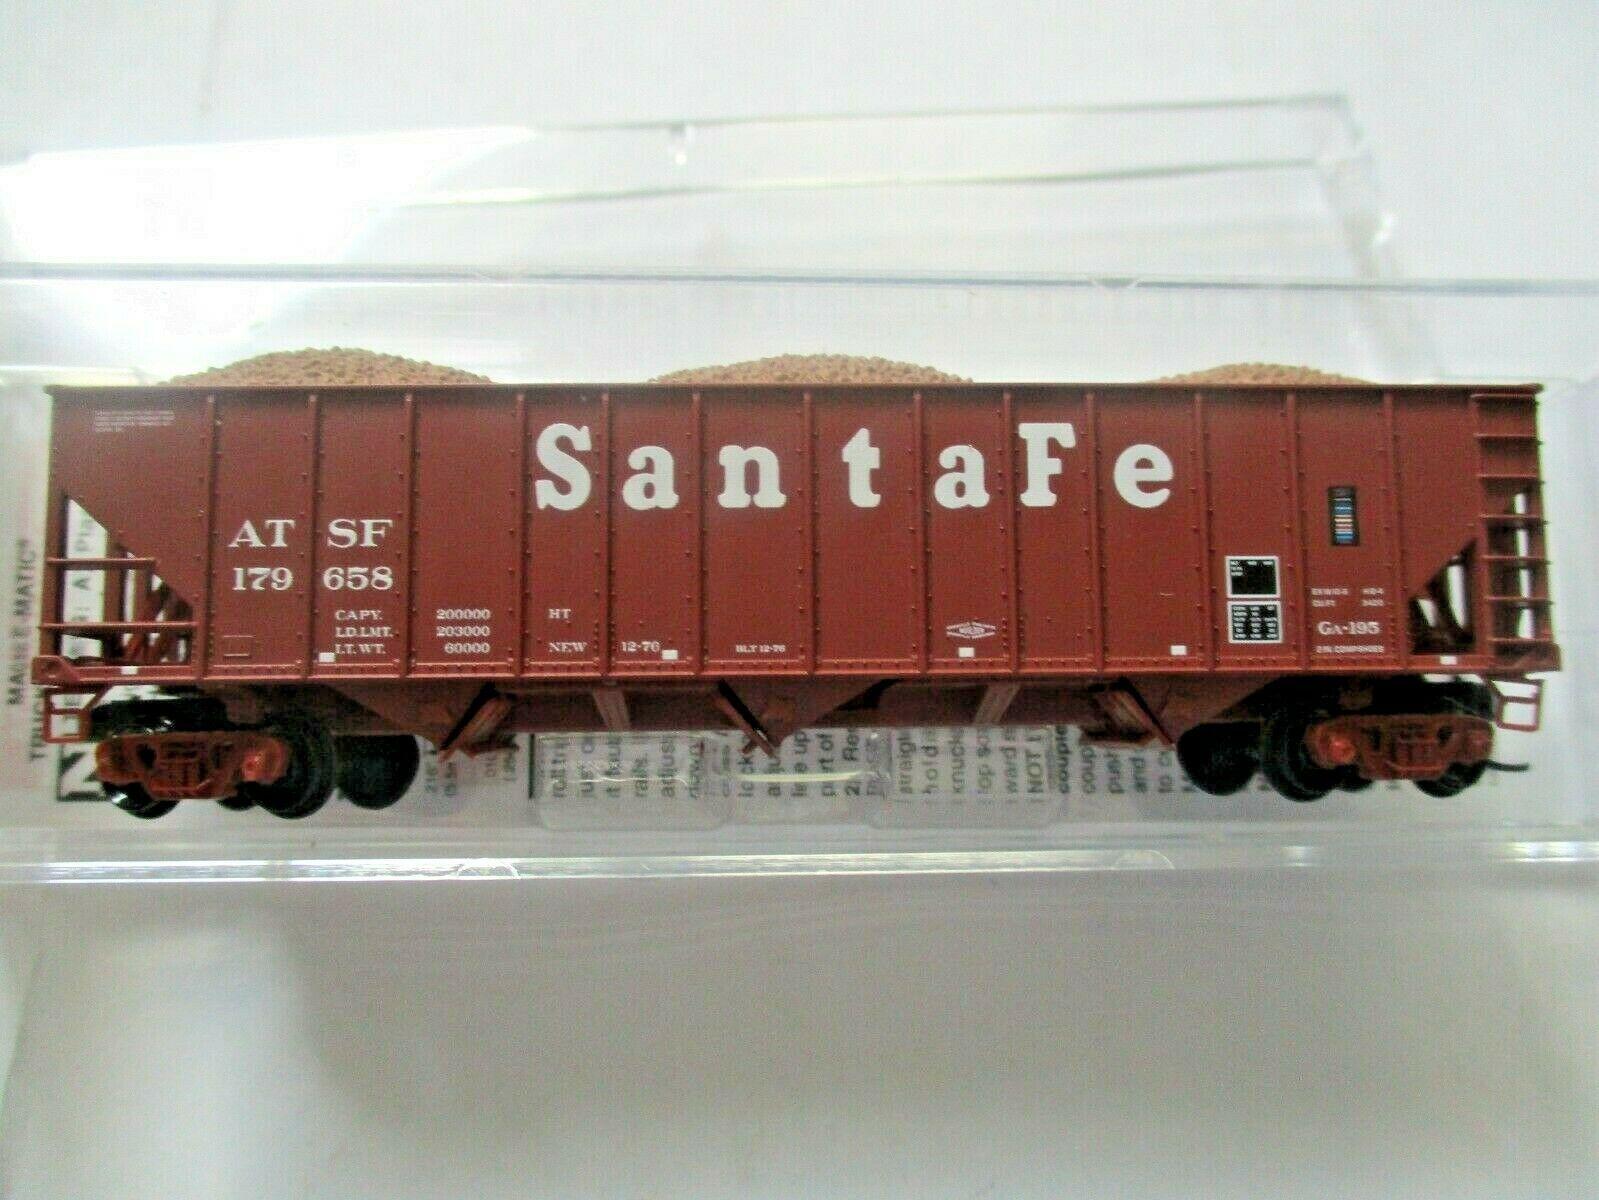 Micro-Trains # 10800123 Atchison, Topeka & Santa Fe 100 Ton 3-Bay Hopper N-Scale